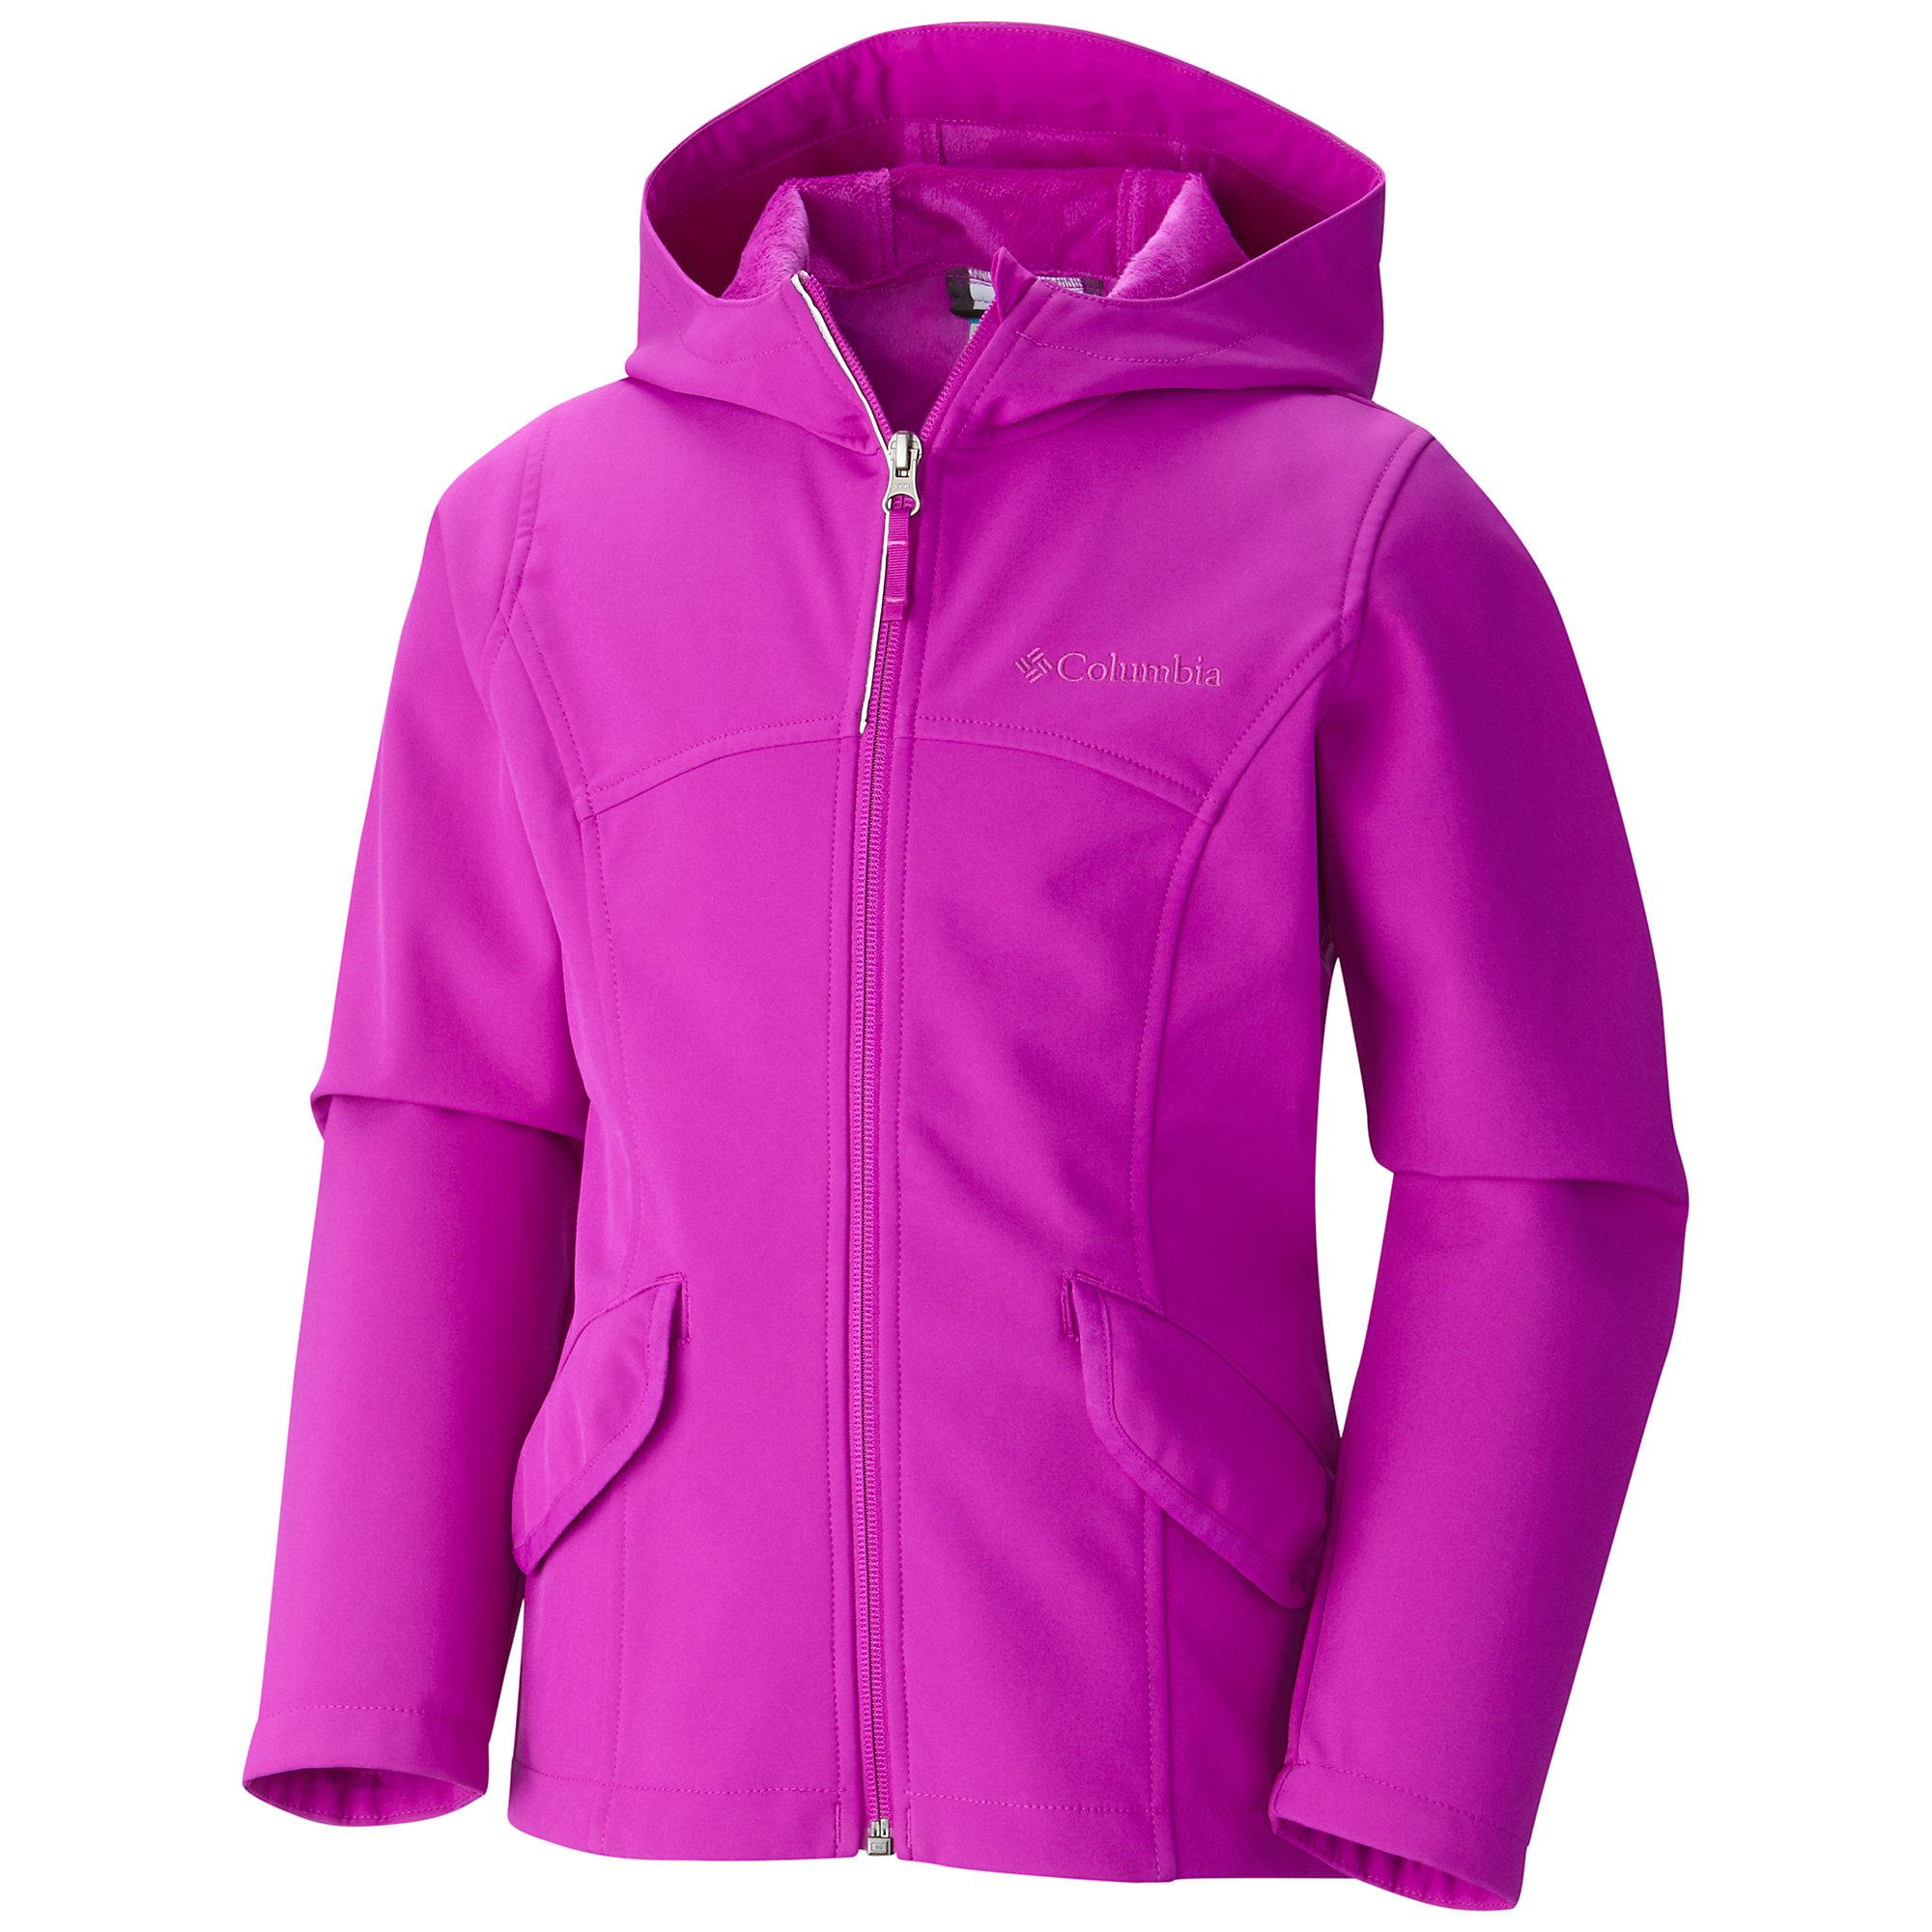 Columbia Phurtec Softshell Hooded Jacket